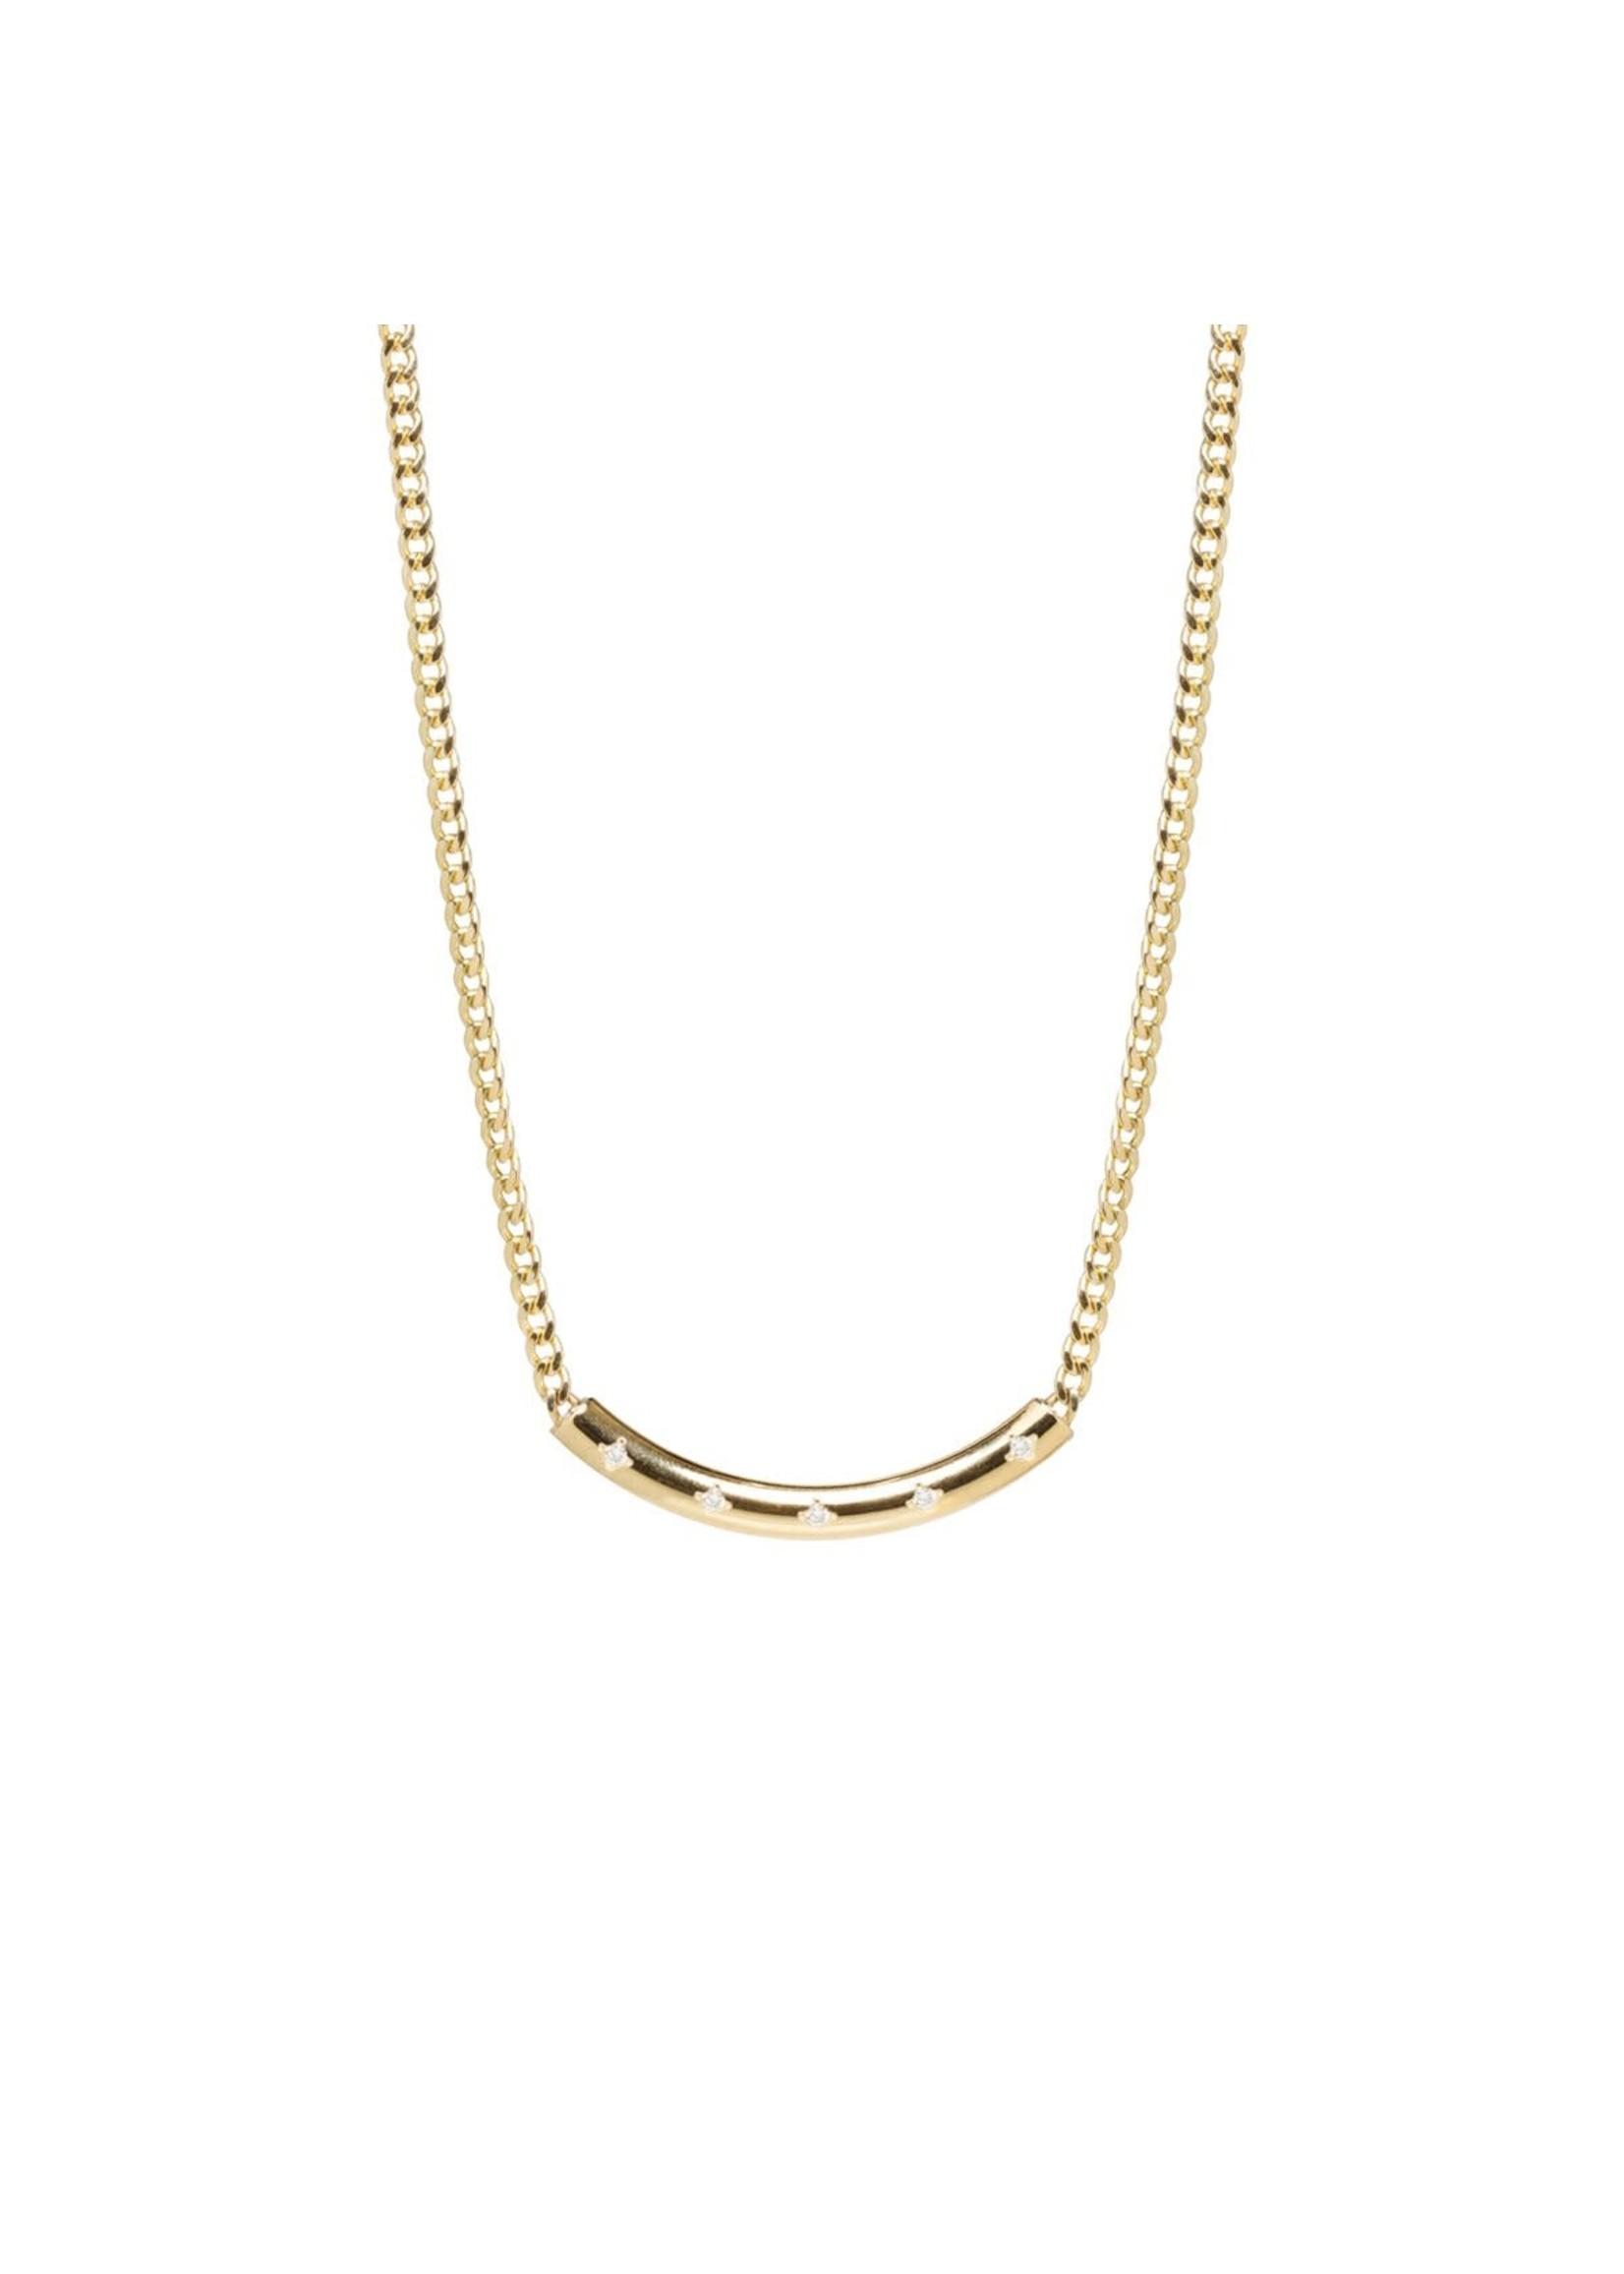 Zoe Chicco X-Small Curb Chain Necklace